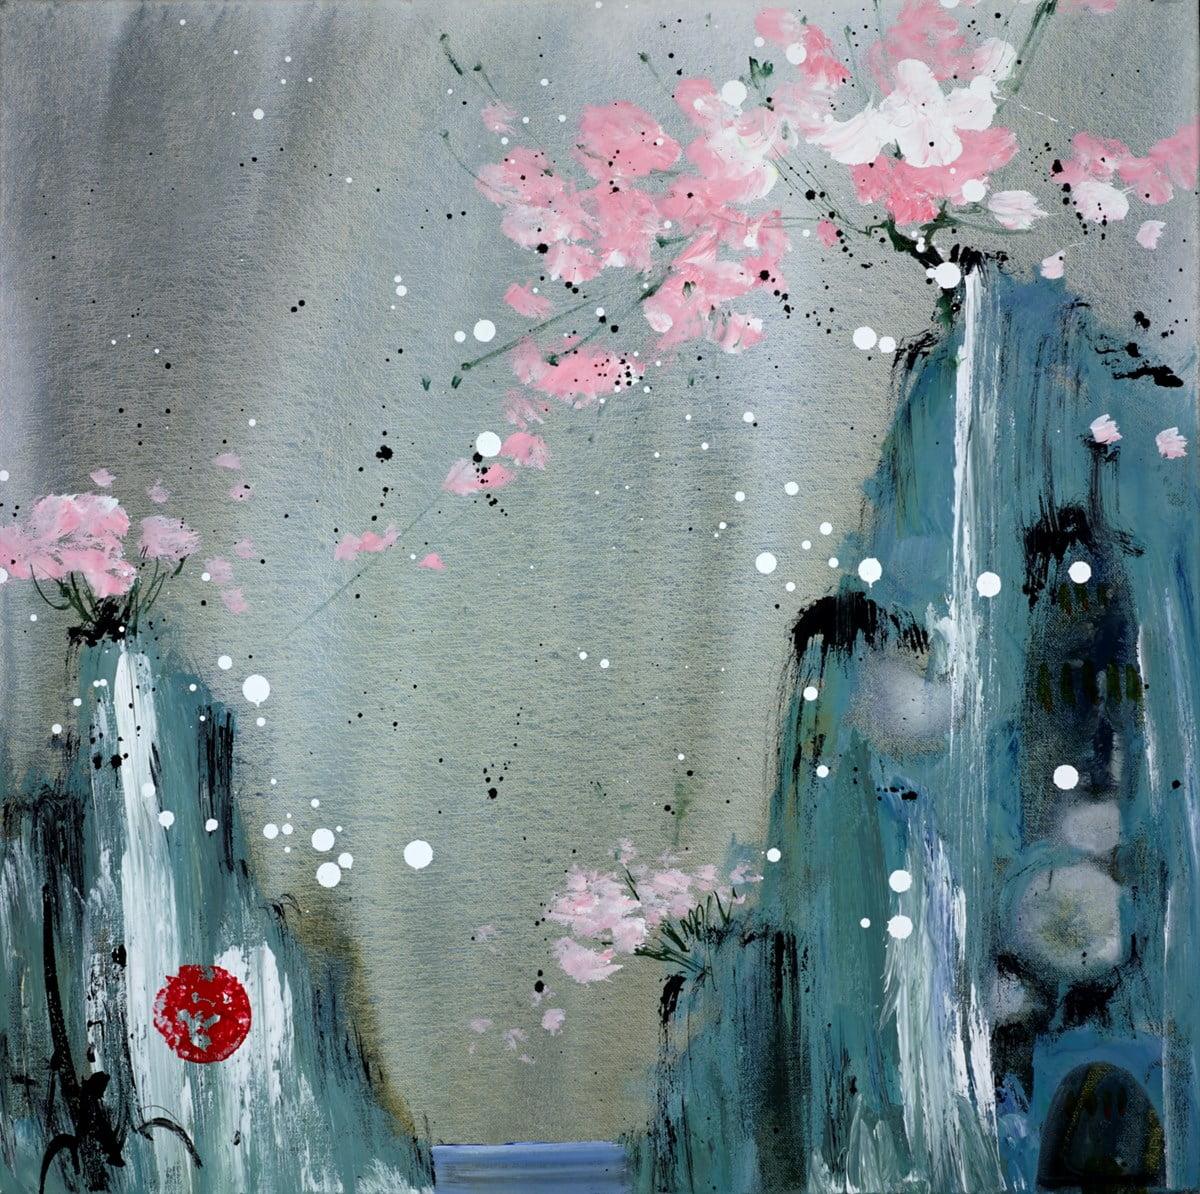 Mists of Time II ~ Danielle O'Connor Akiyama